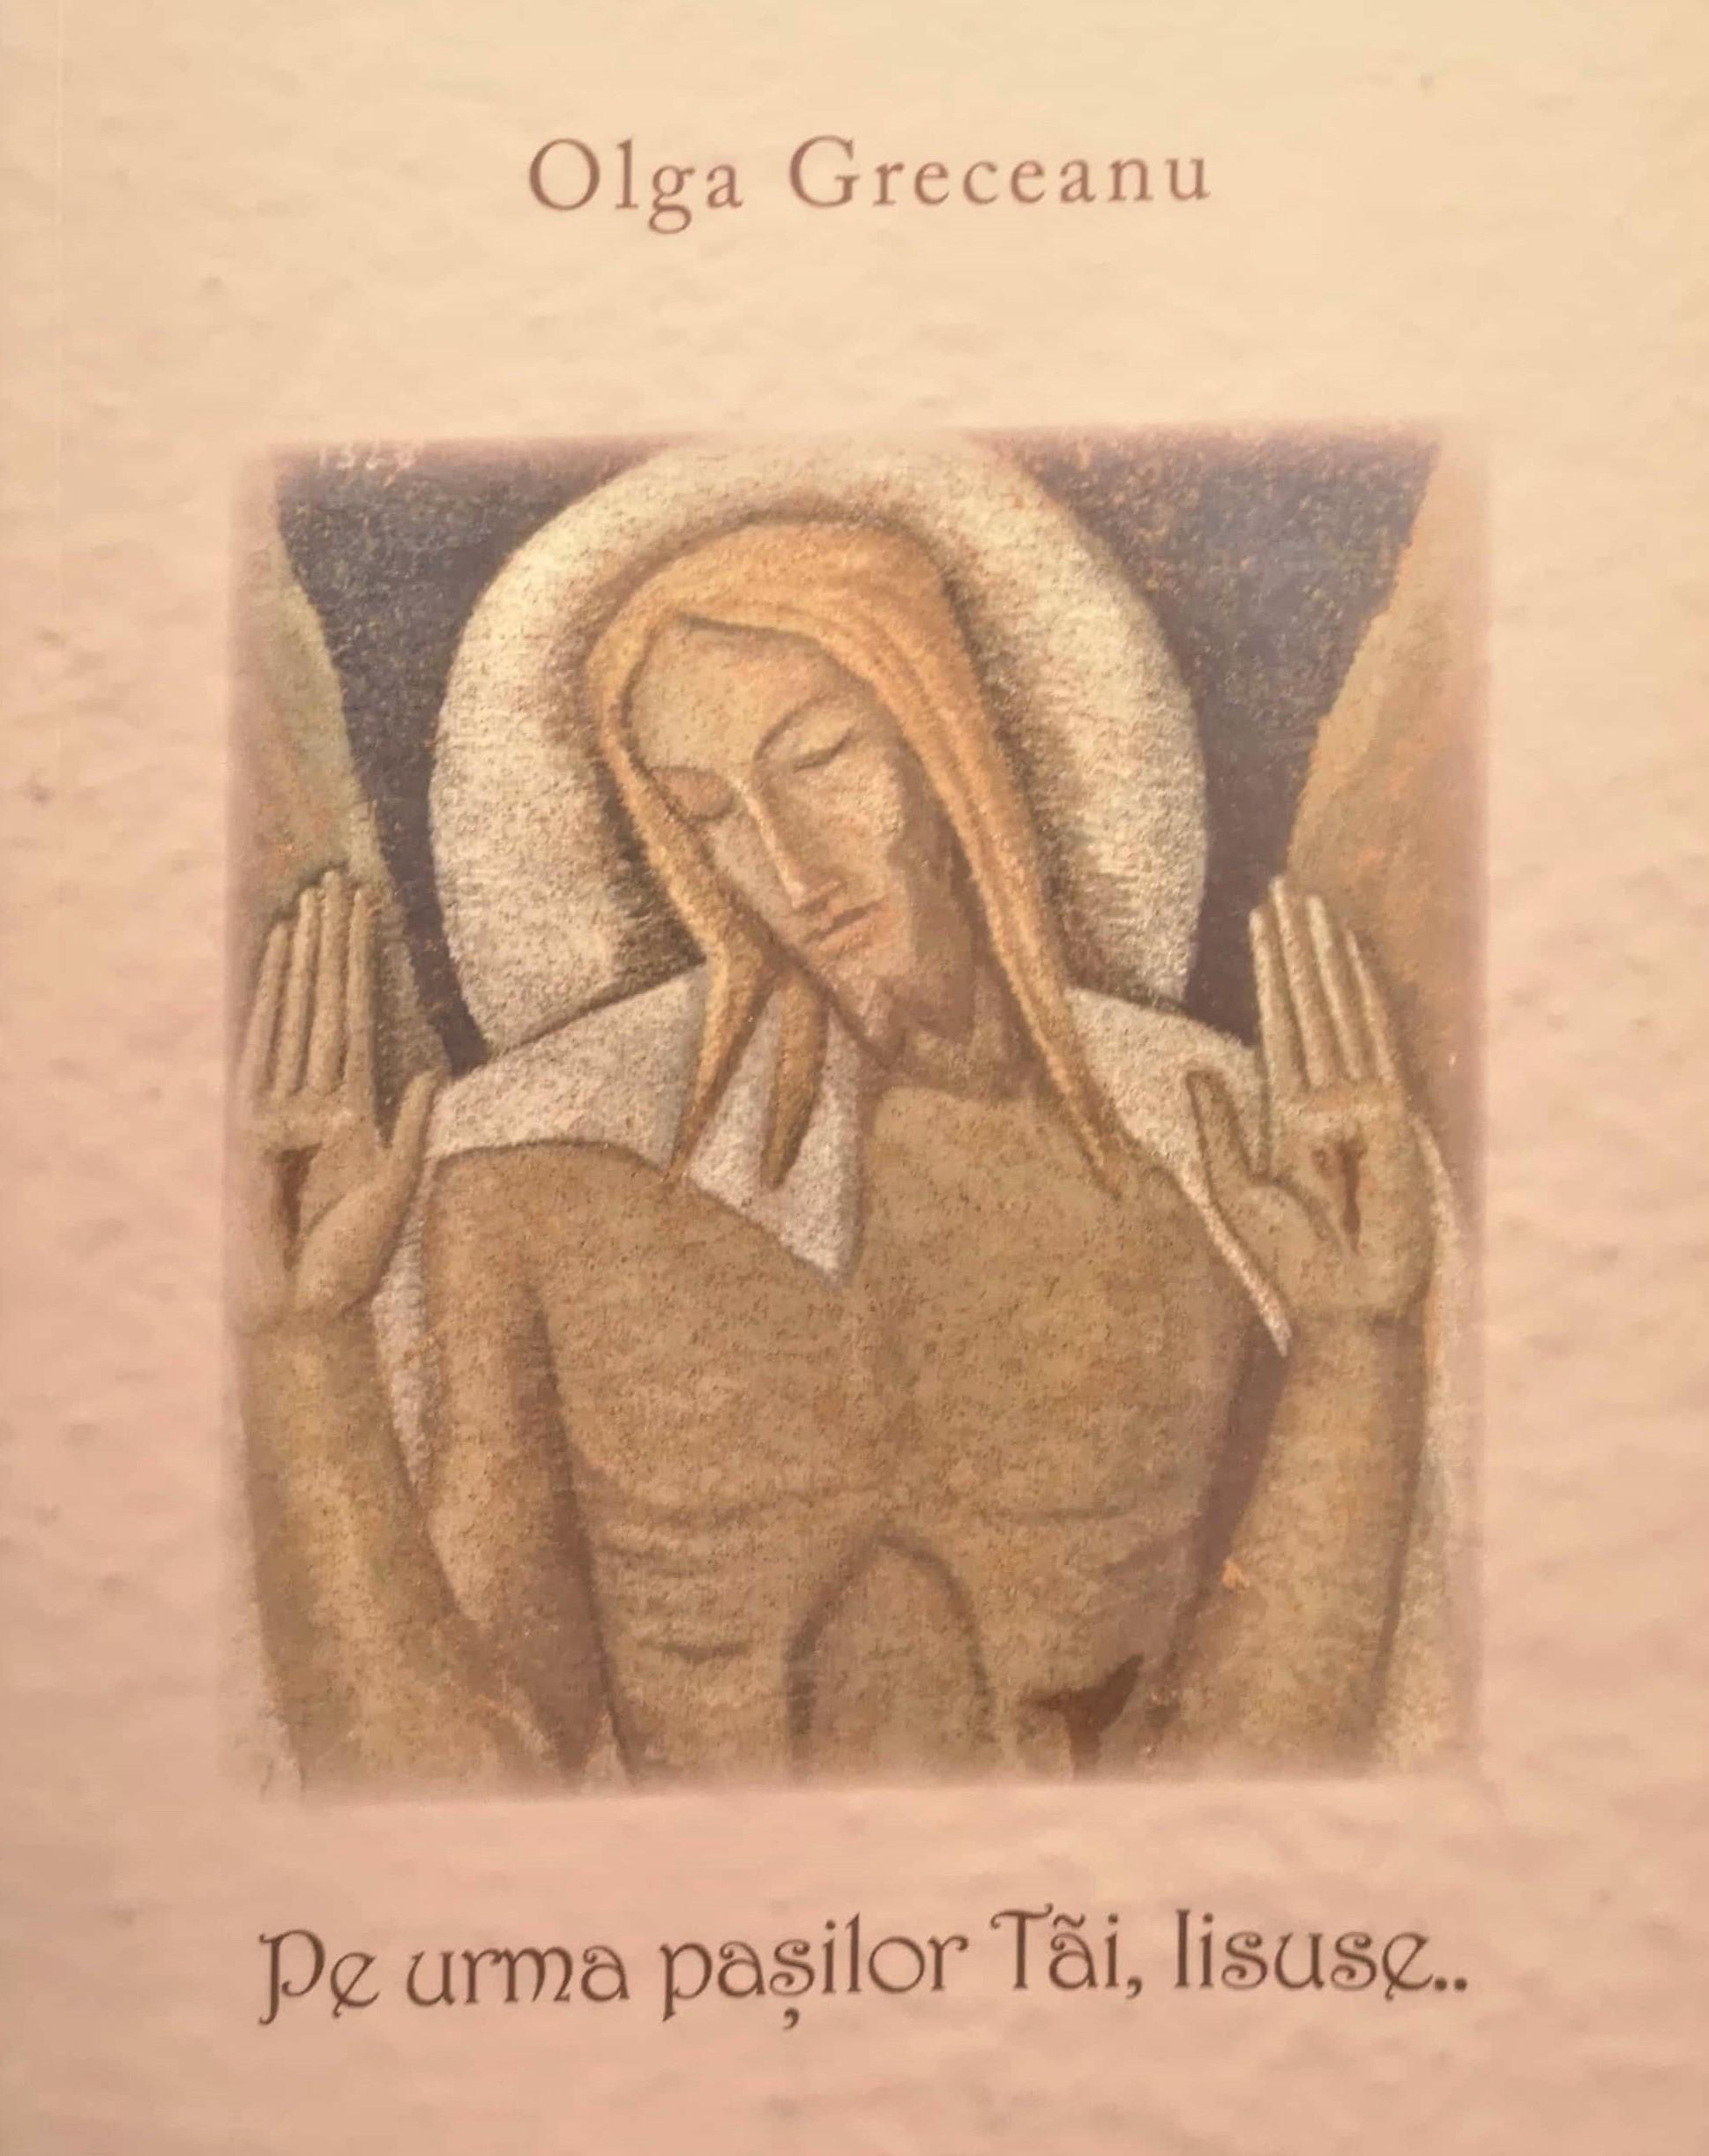 Pe urma pasilor tai Iisuse de Olga Greceanu editie 2019